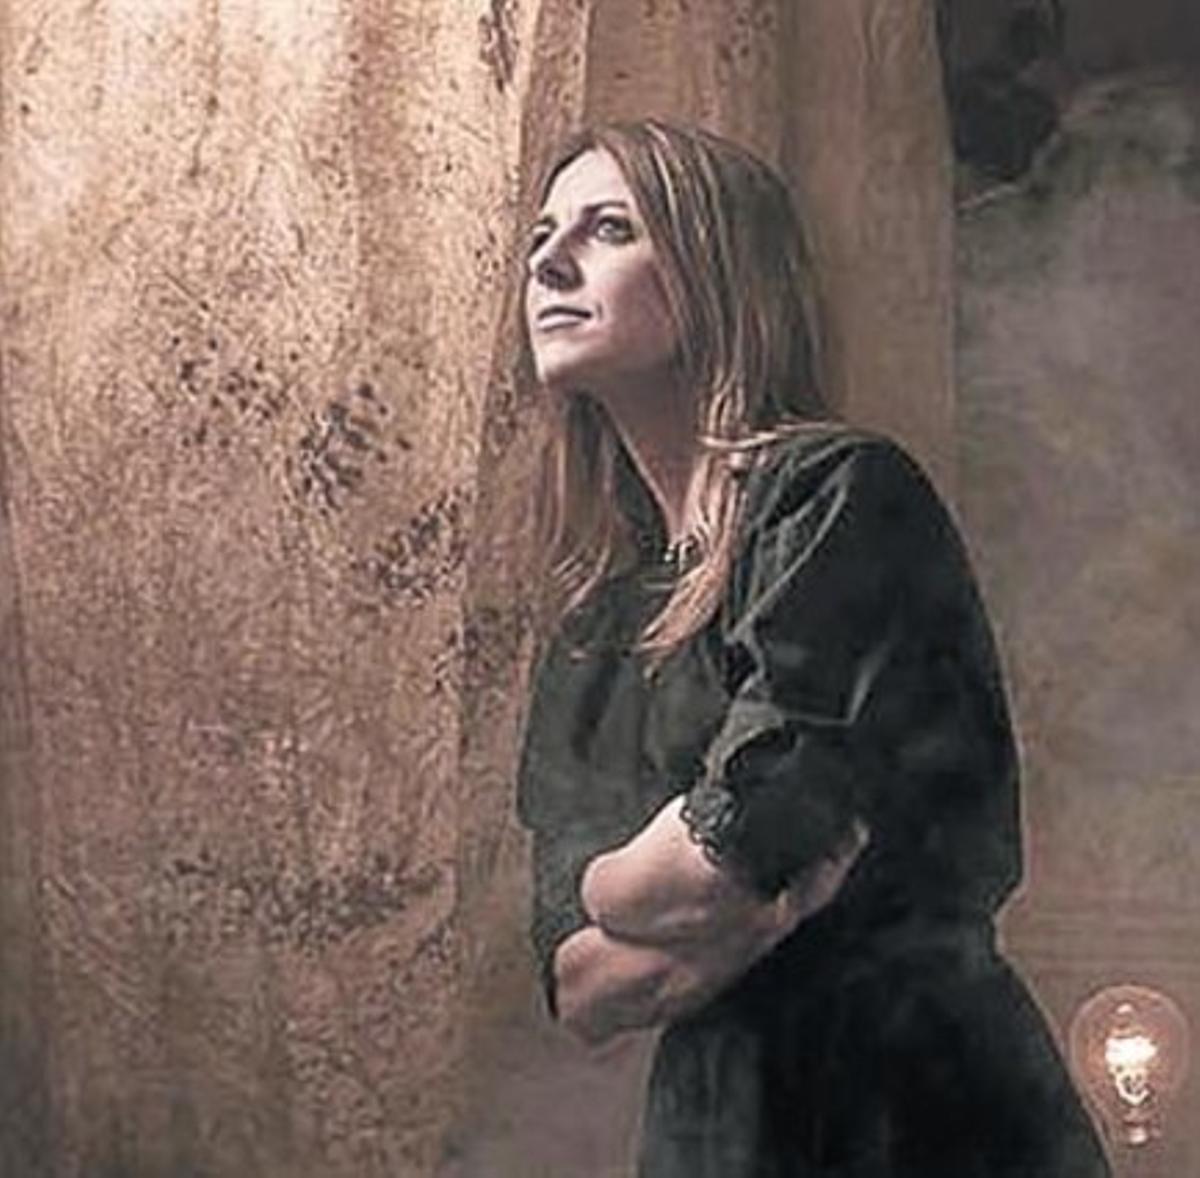 La cantaura Vicky de Clascà, alias Bikimel.